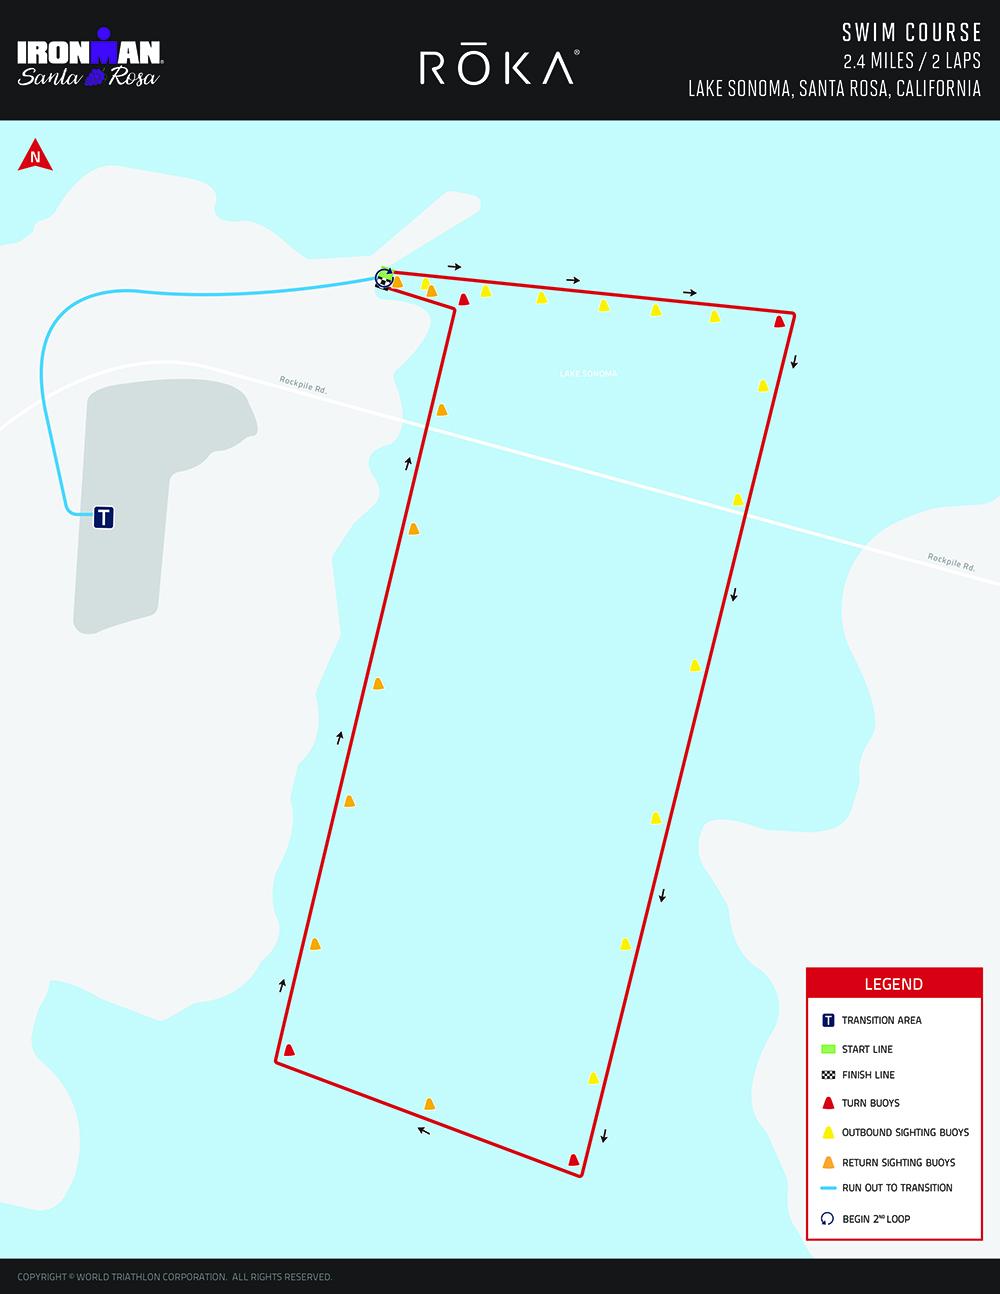 SWIMSMALLim santarosa19 coursemap swim 32219 cc web.jpg